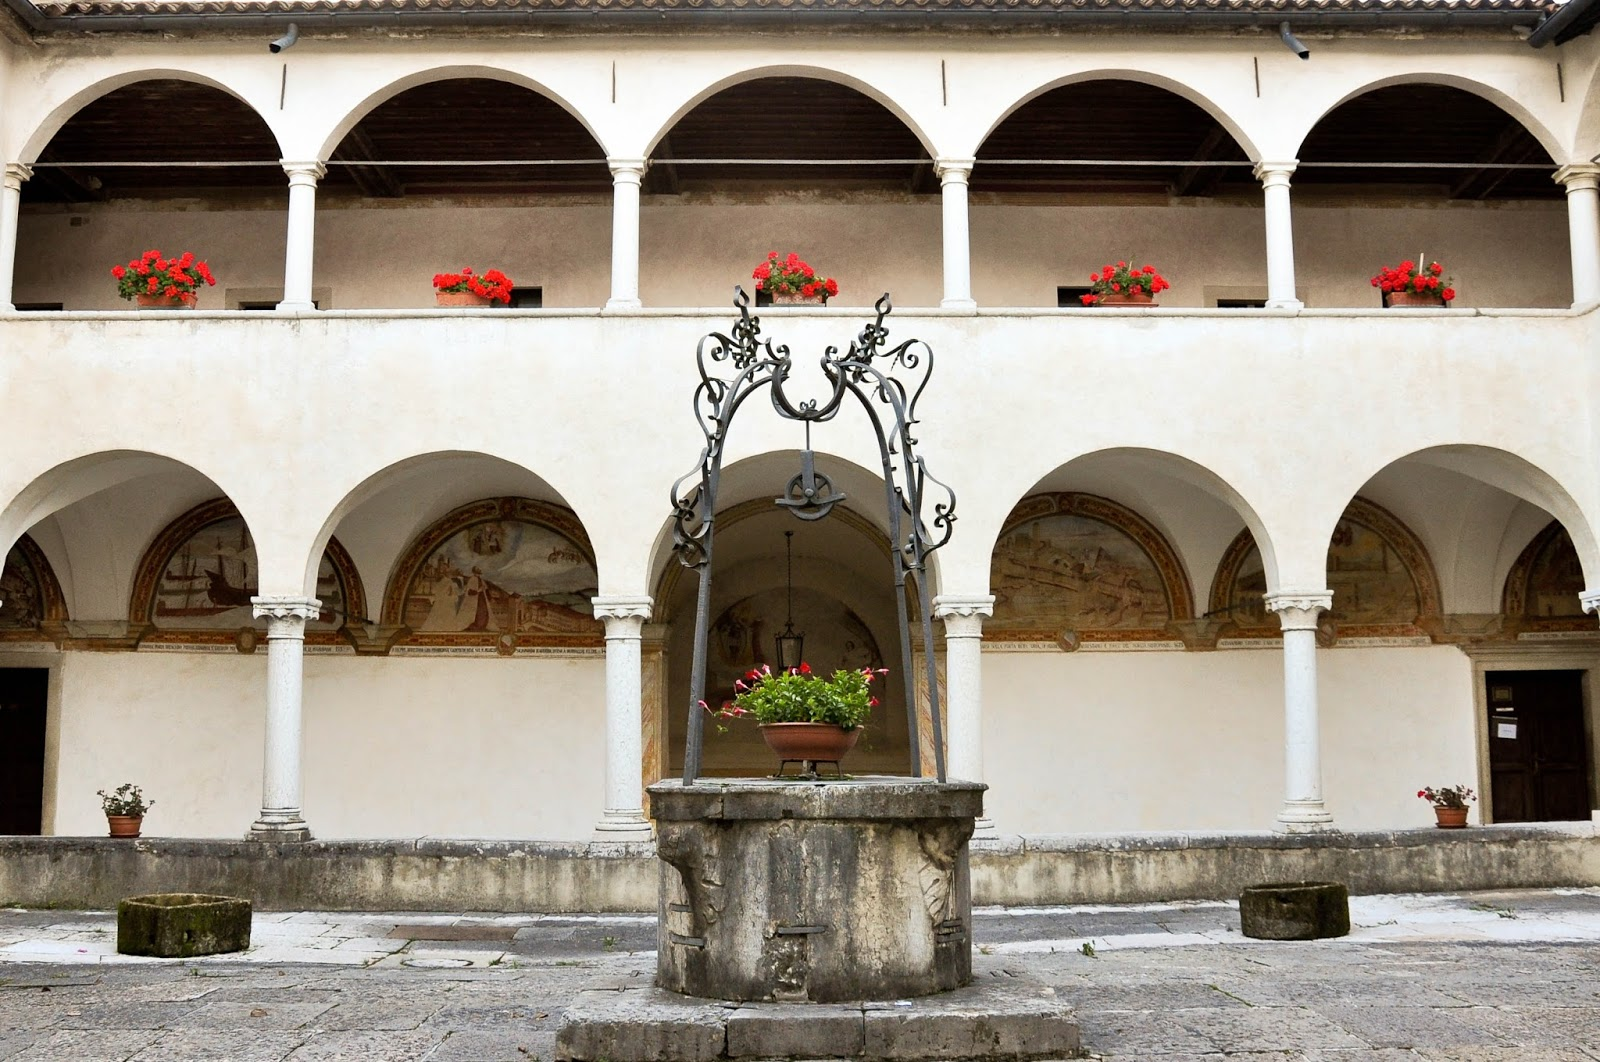 Cloister, Sanctuary of St. St. Vittore e Corona, Feltre, Veneto, Italy